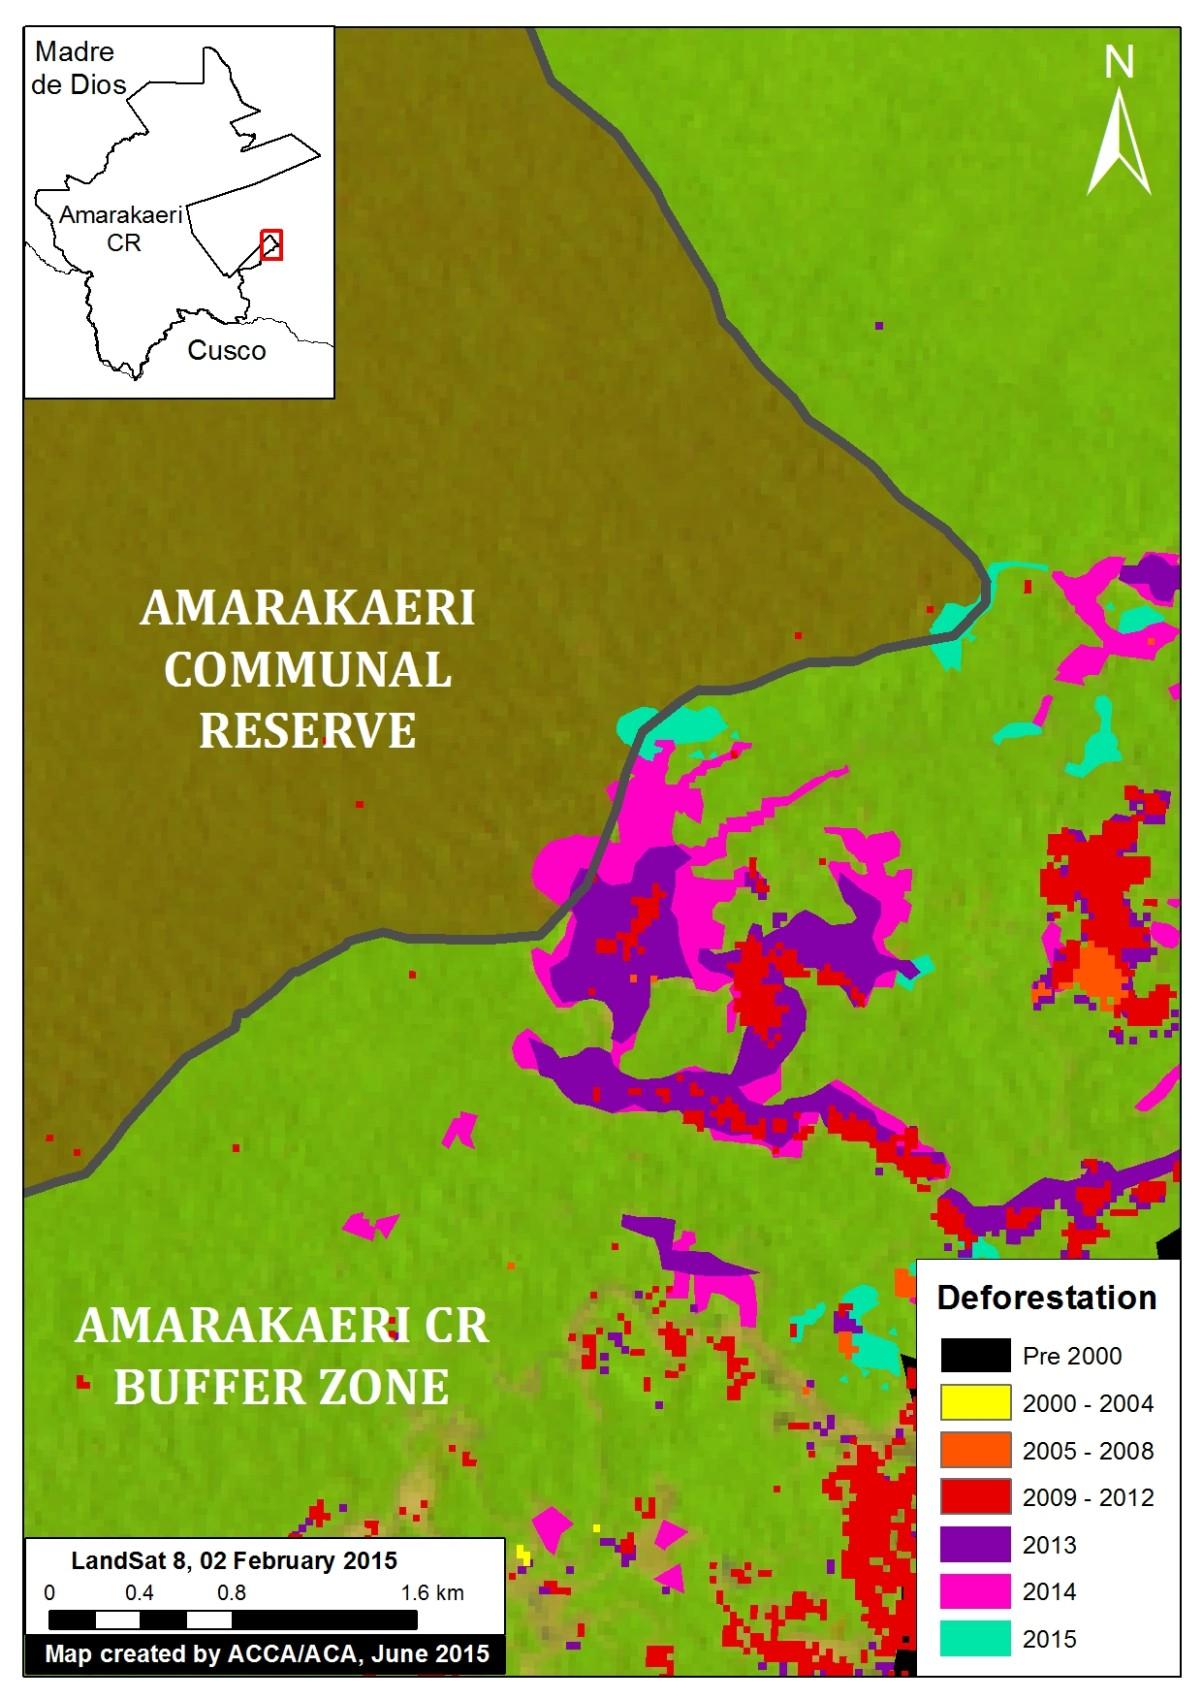 2015_Amarakaeri_MAAP_6b_deforestation_MAAP